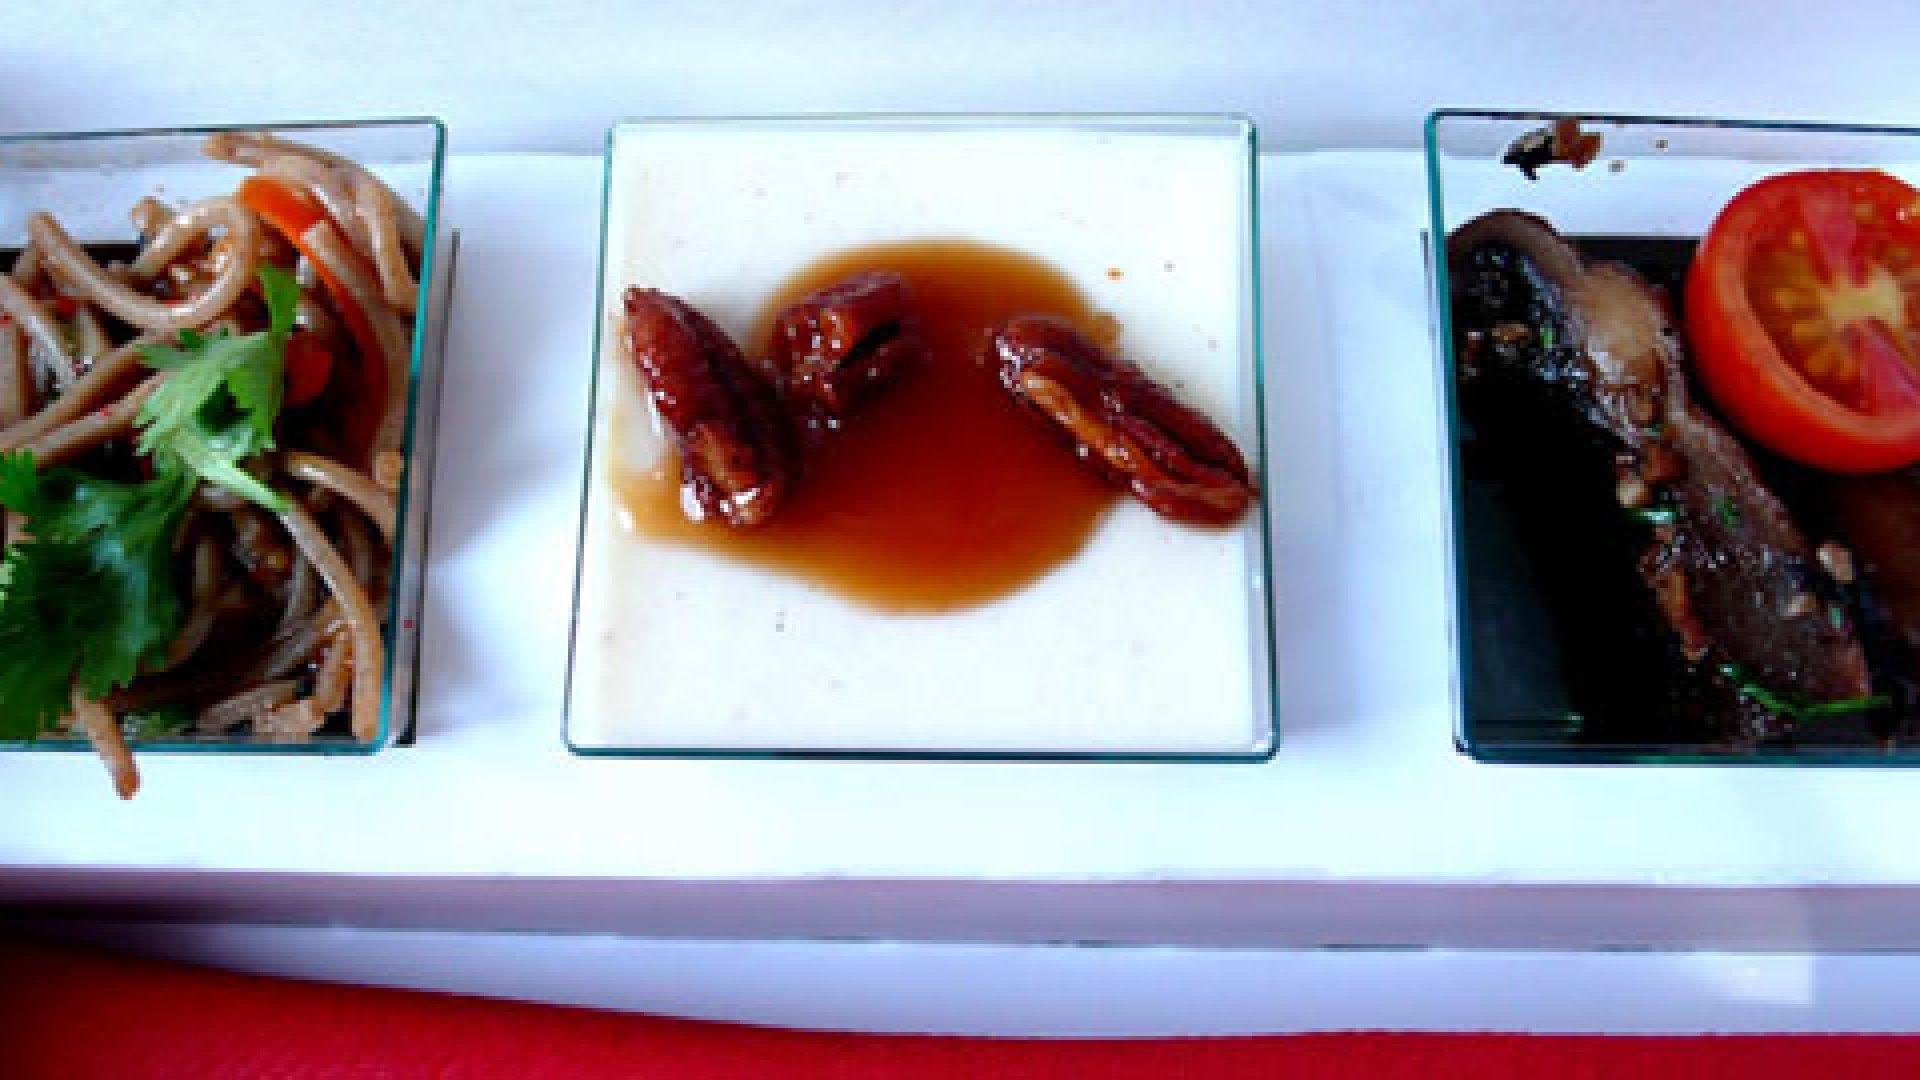 """Soba noodle salad, panna cotta with a pecan praline sauce, and balsamico braised shiitake mushrooms."" - chotda"